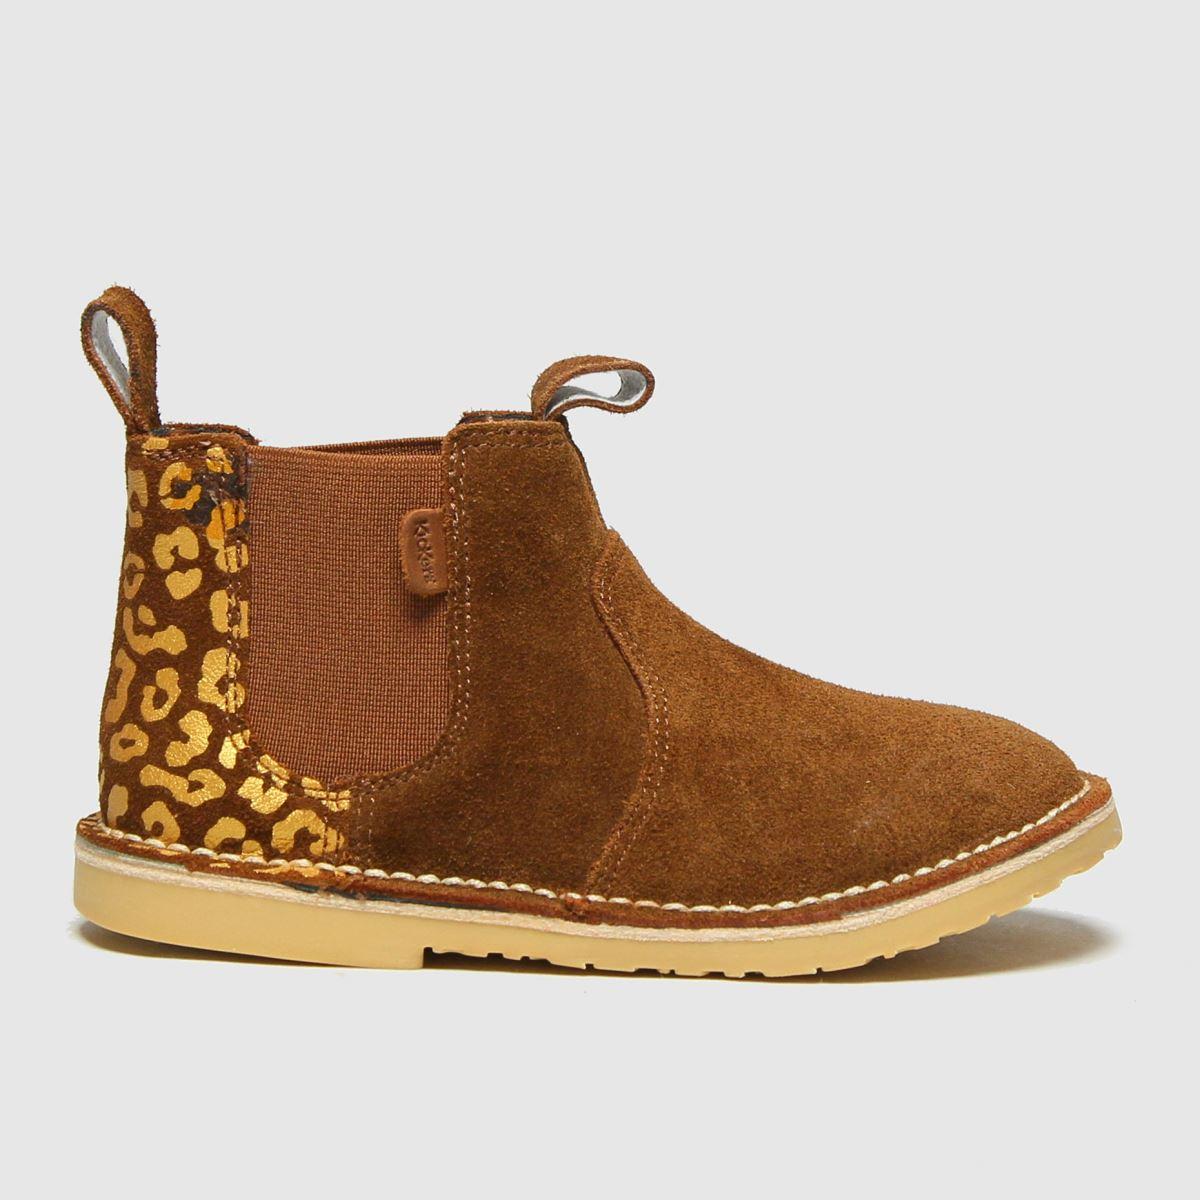 Kickers Tan Adlar Chelz Leopard Boots Toddler